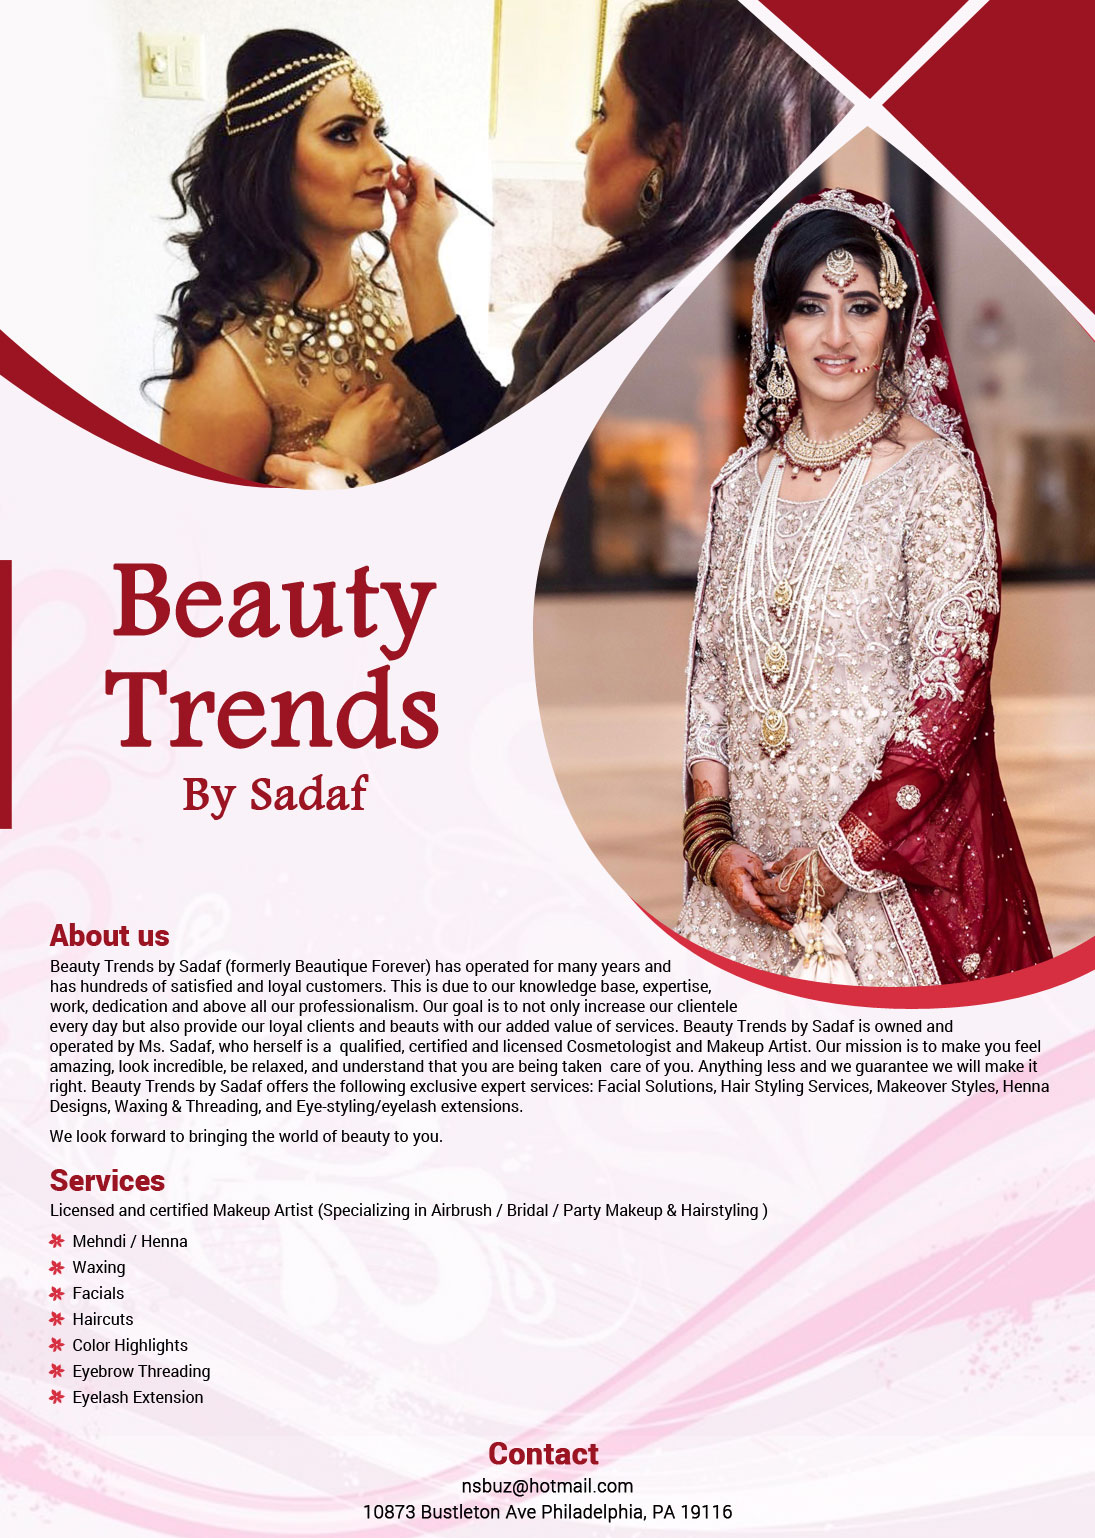 Beauty Trends By Sadaf - Mehndi Artist - Philadelphia, PA